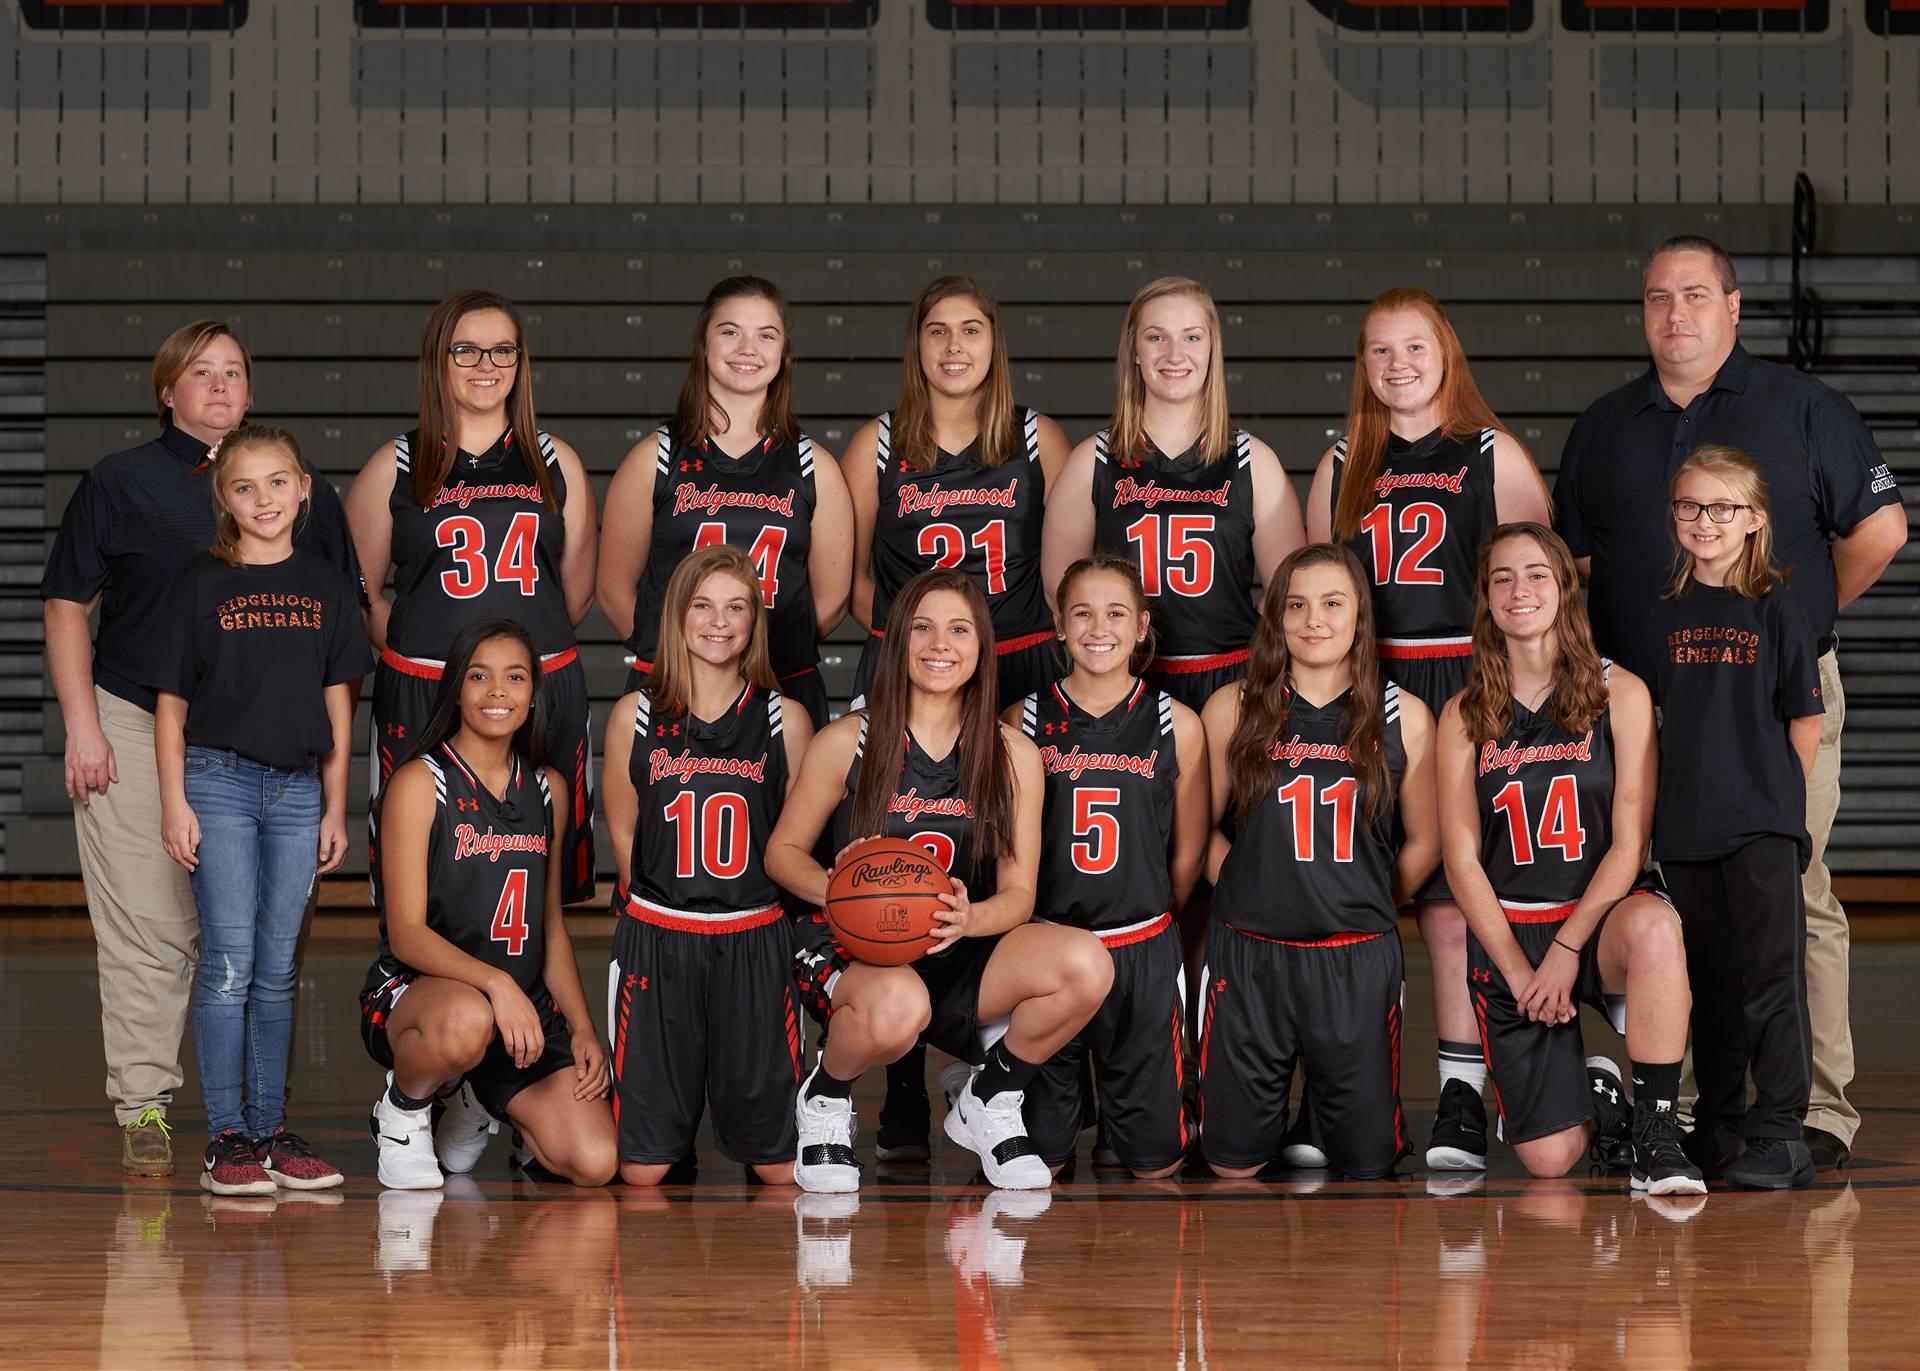 HS Girls Basketball - Varsity Team